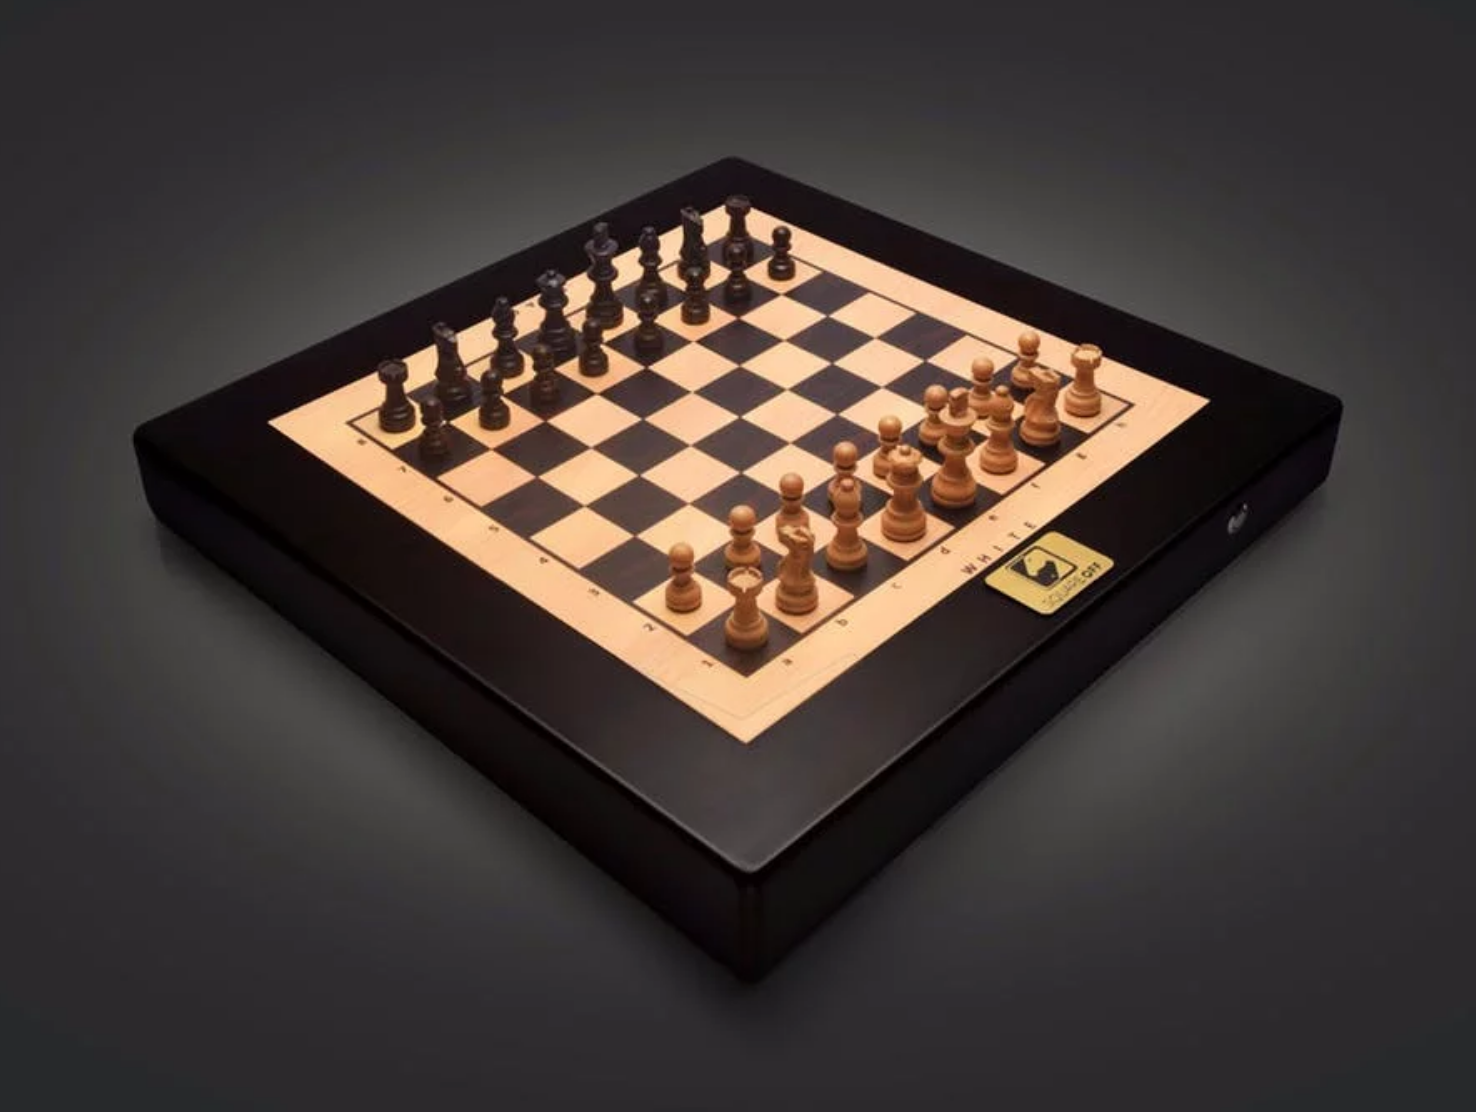 tabuleiro de xadrez futuro 2